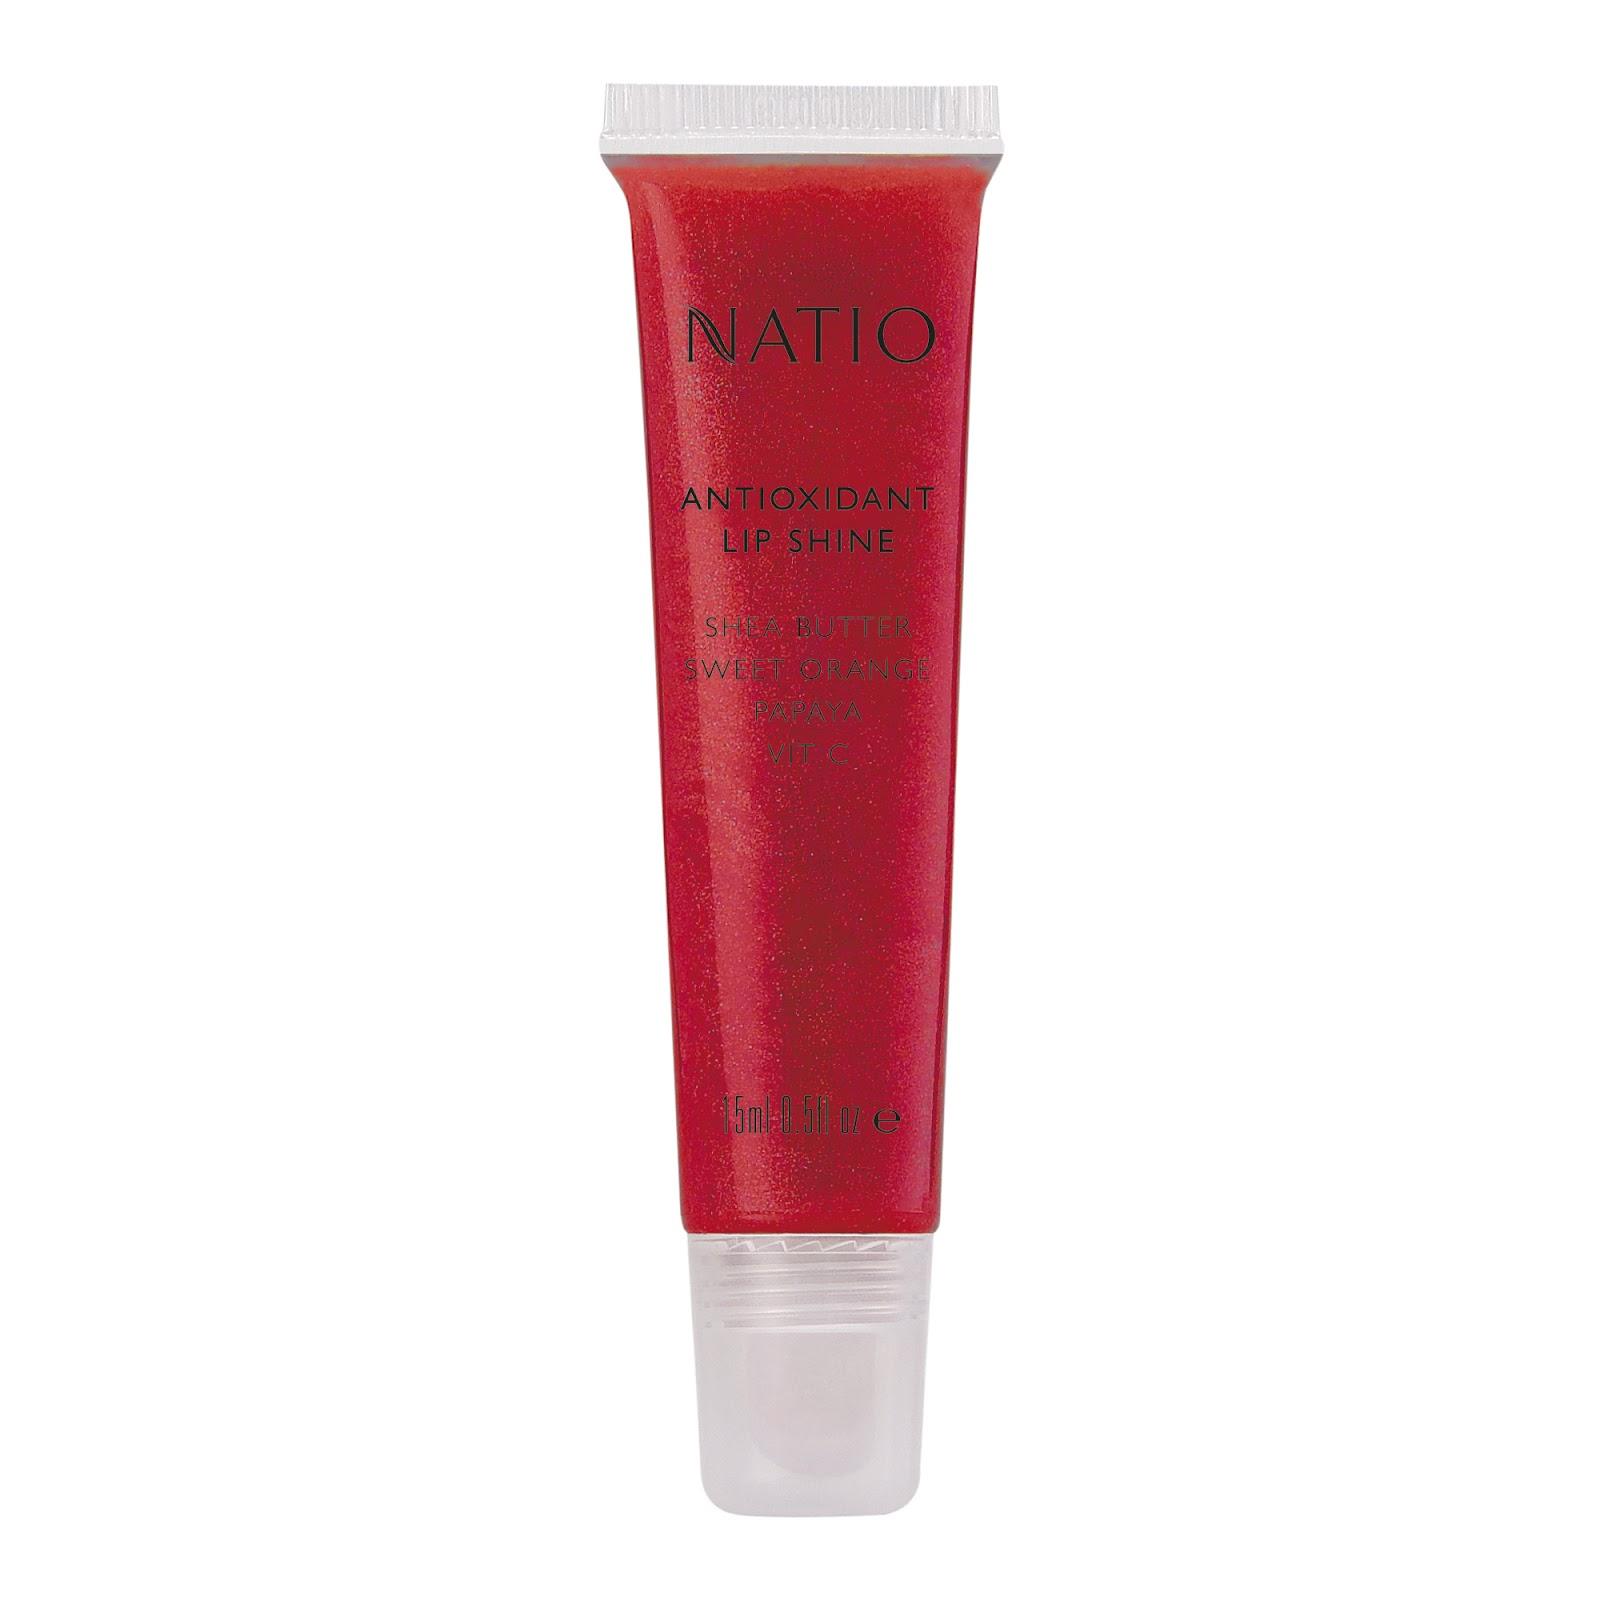 http://4.bp.blogspot.com/-QNEihZlYJOM/TzfkYRtOPwI/AAAAAAAABxQ/LhrDPn7b8T8/s1600/NATIO_Antioxidant_Lip_Shine_Love.jpg